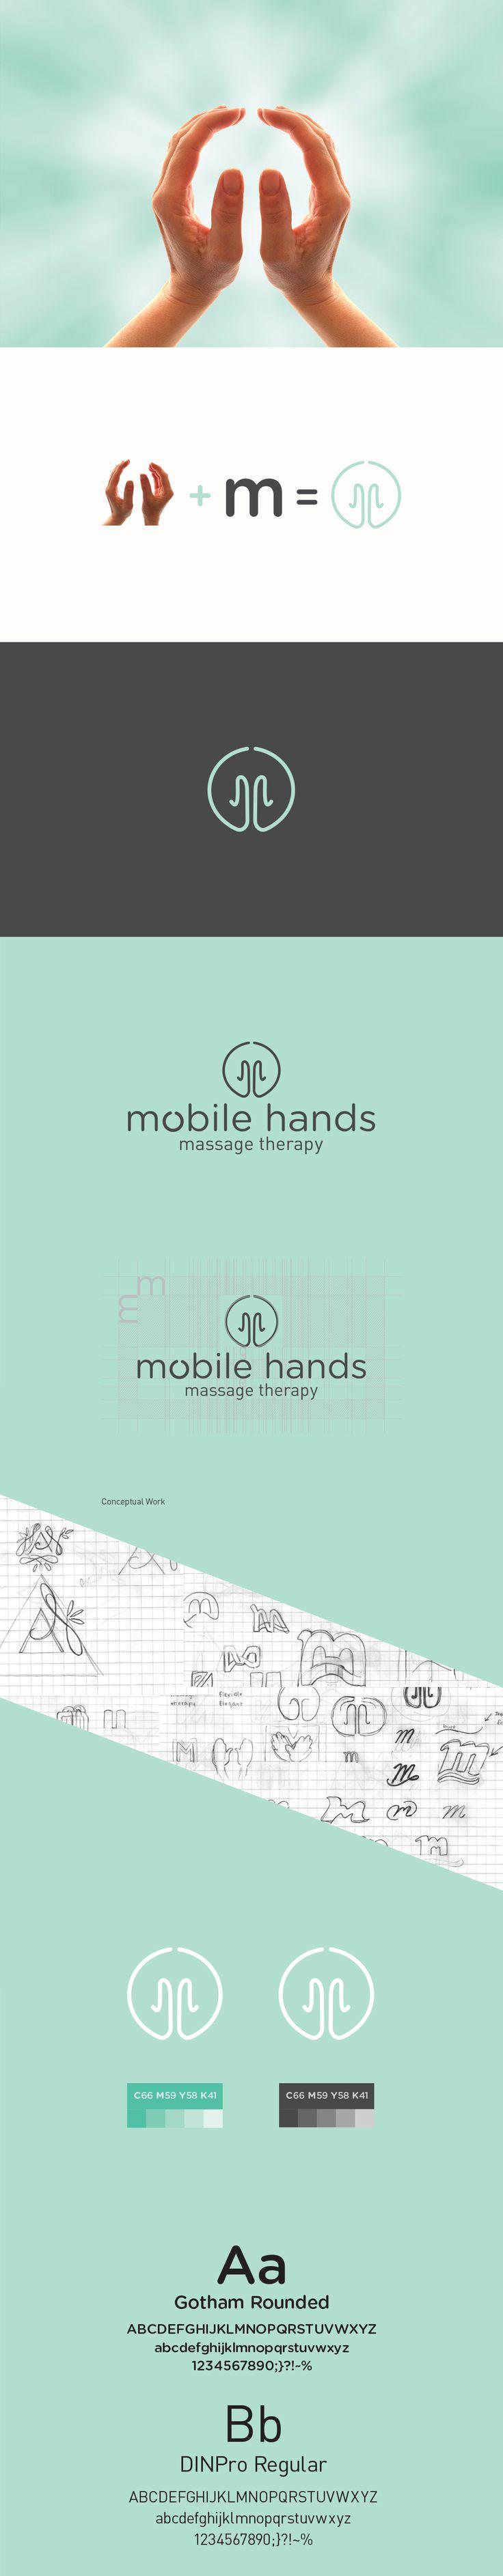 Branding and Logo Development for Massage Therapist. by Thain Lurk  www.thaincreative.com